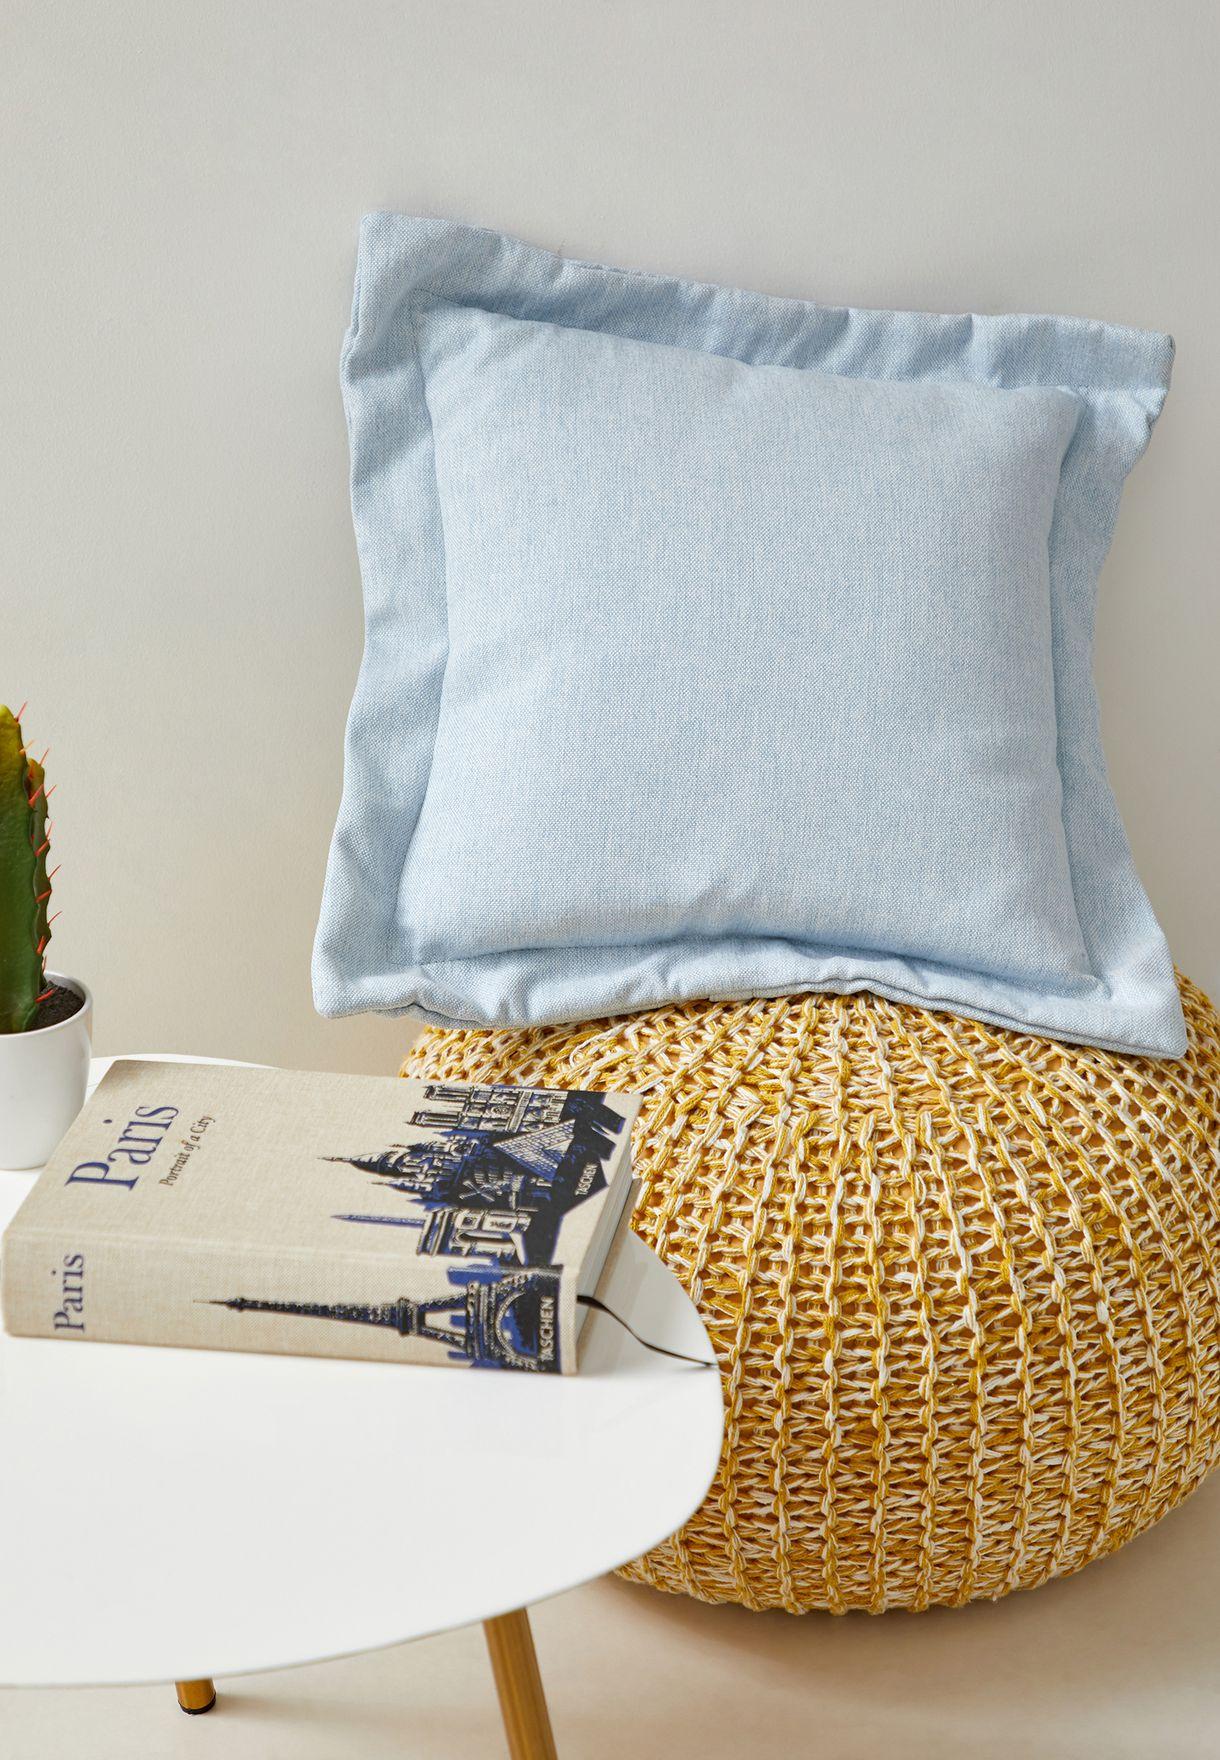 Light Blue Cushion With Insert45x45 cm